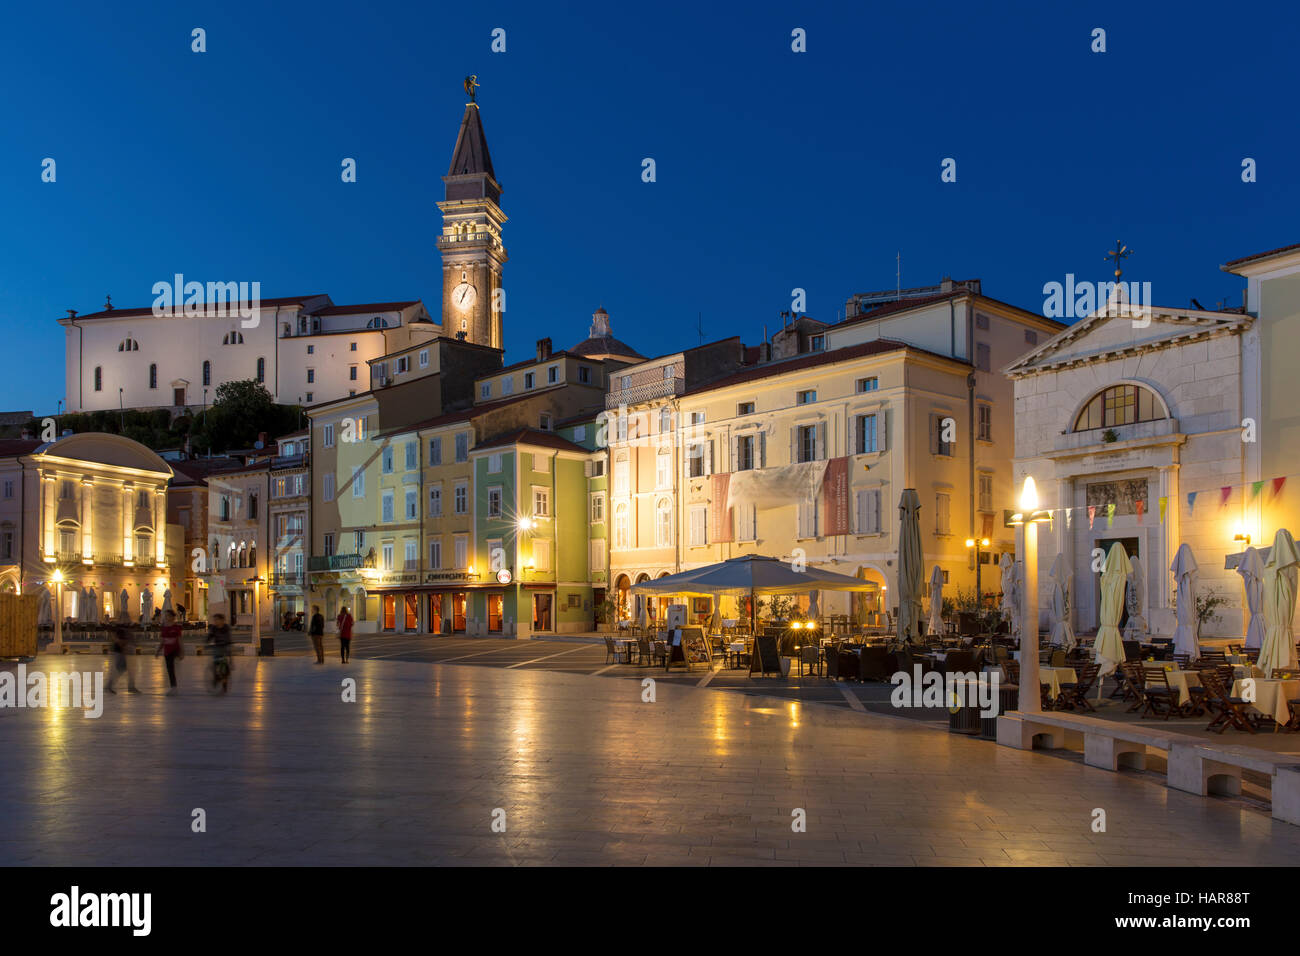 Twilight over St. George's Parish Church and town center (Tartinijev trg), Piran, Primorska, Slovenia Stock Photo